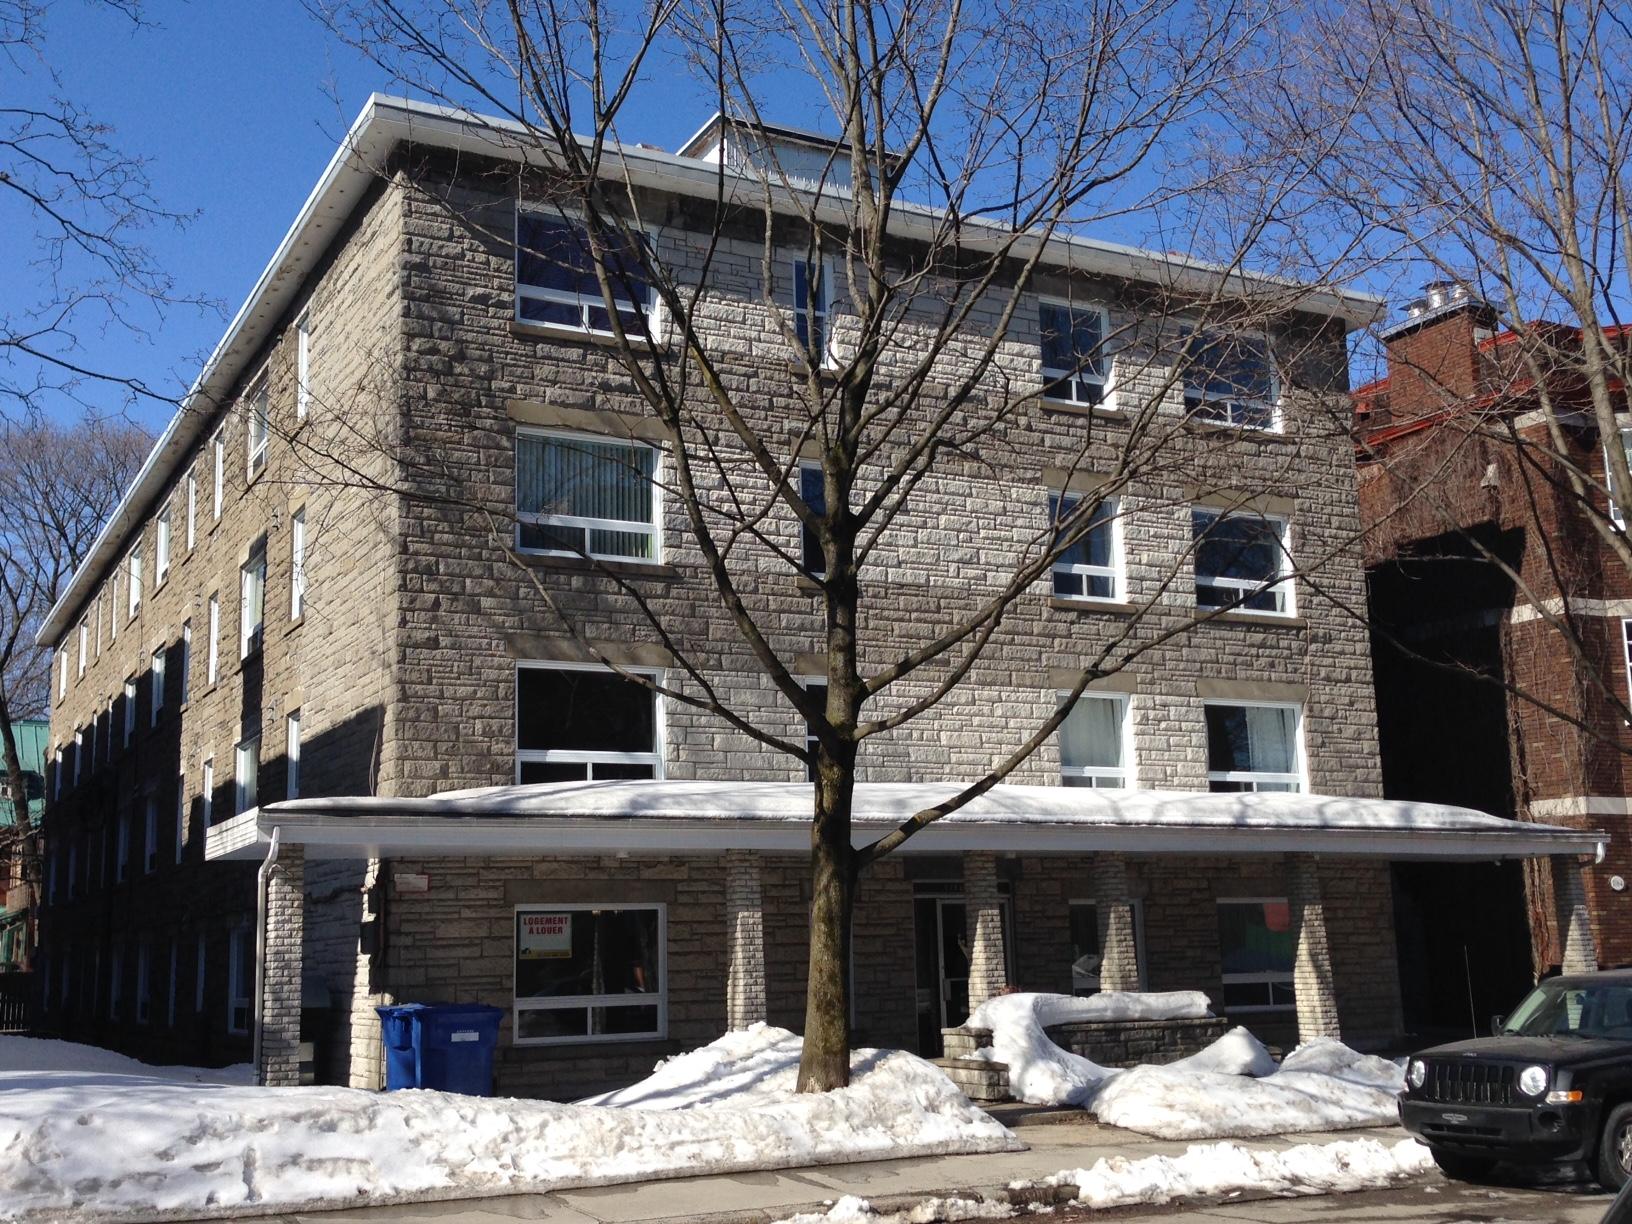 1080, Av. des Érables #401, Québec G1R 2N2